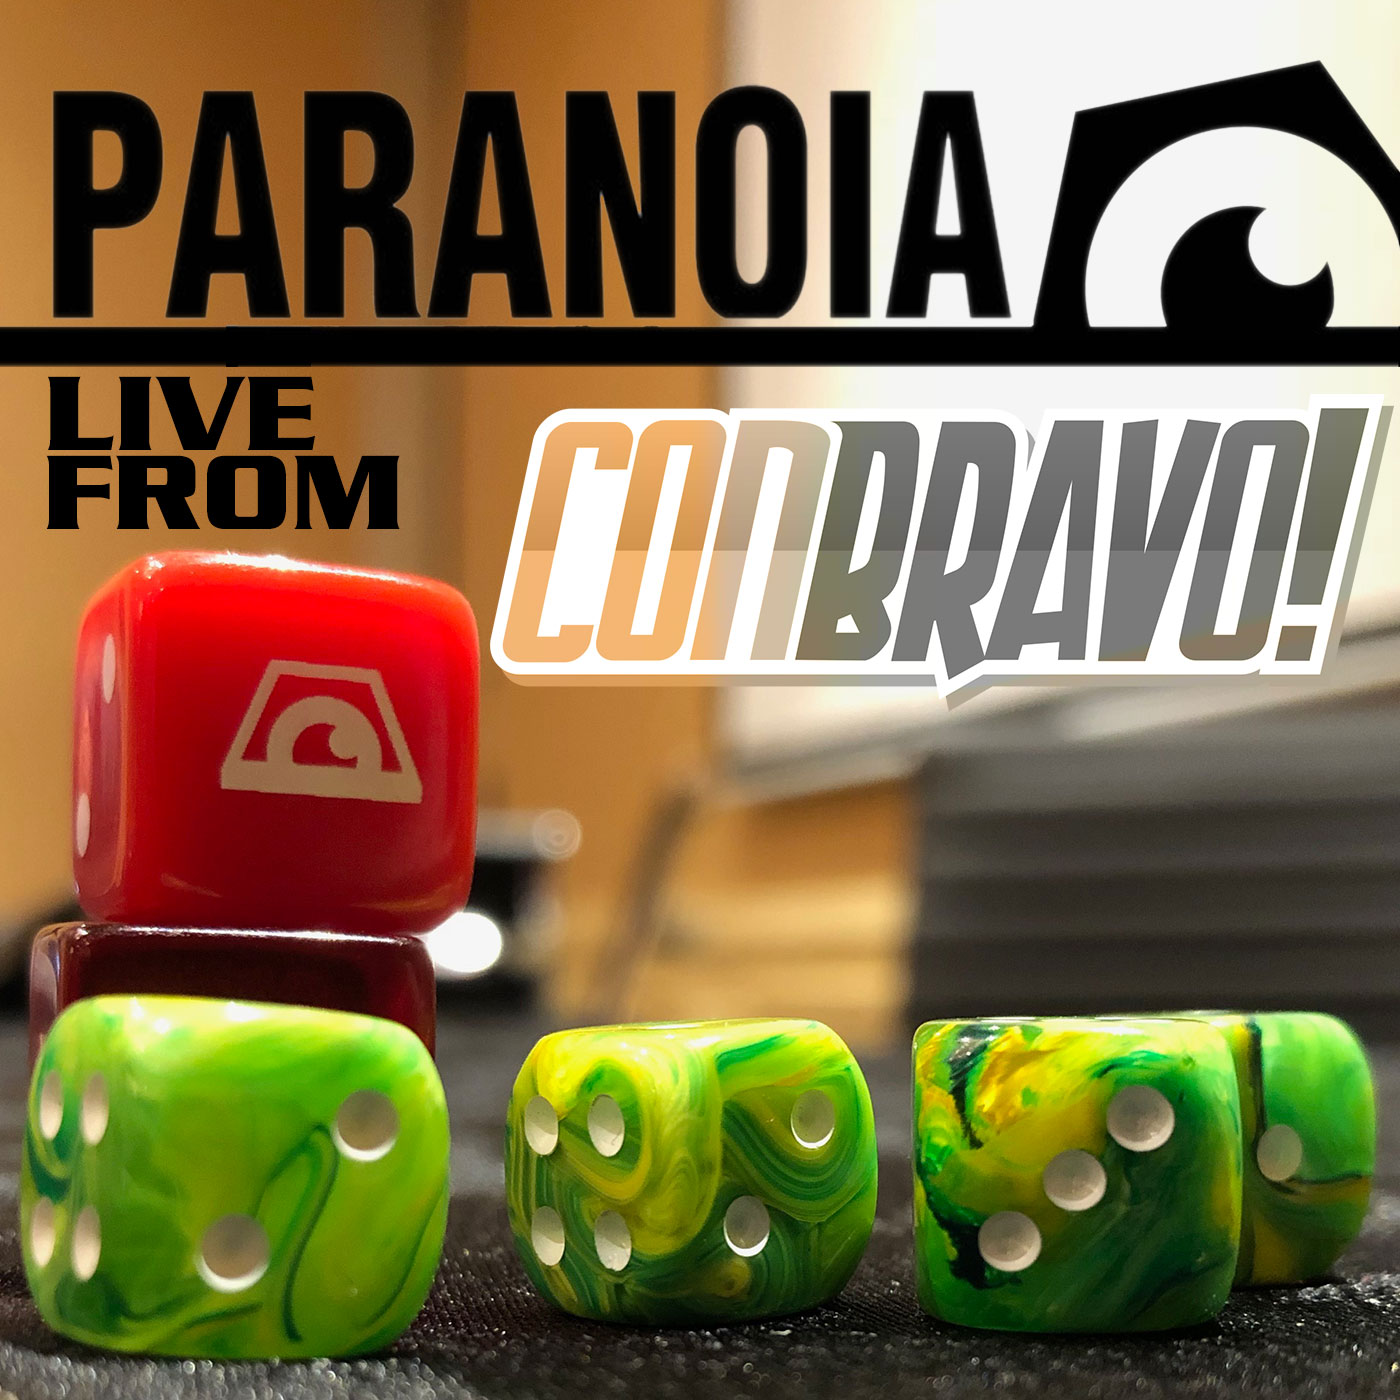 Paranoia-Conbravo-Main-Titlecard.jpg